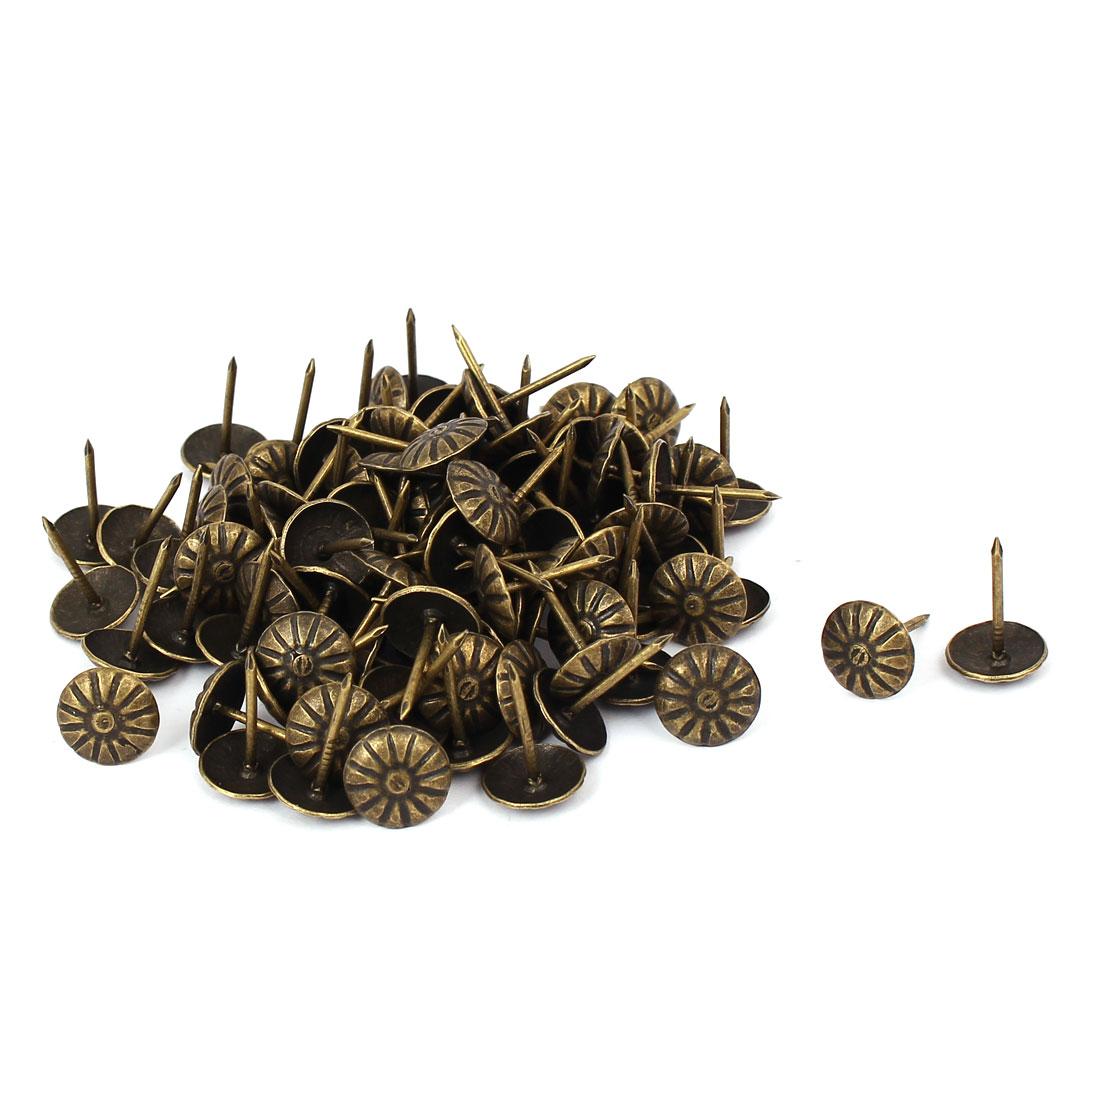 10mm x 15mm Iron Vintage Style Chrysanthemum Upholstery Nail Thumb Tack 100PCS